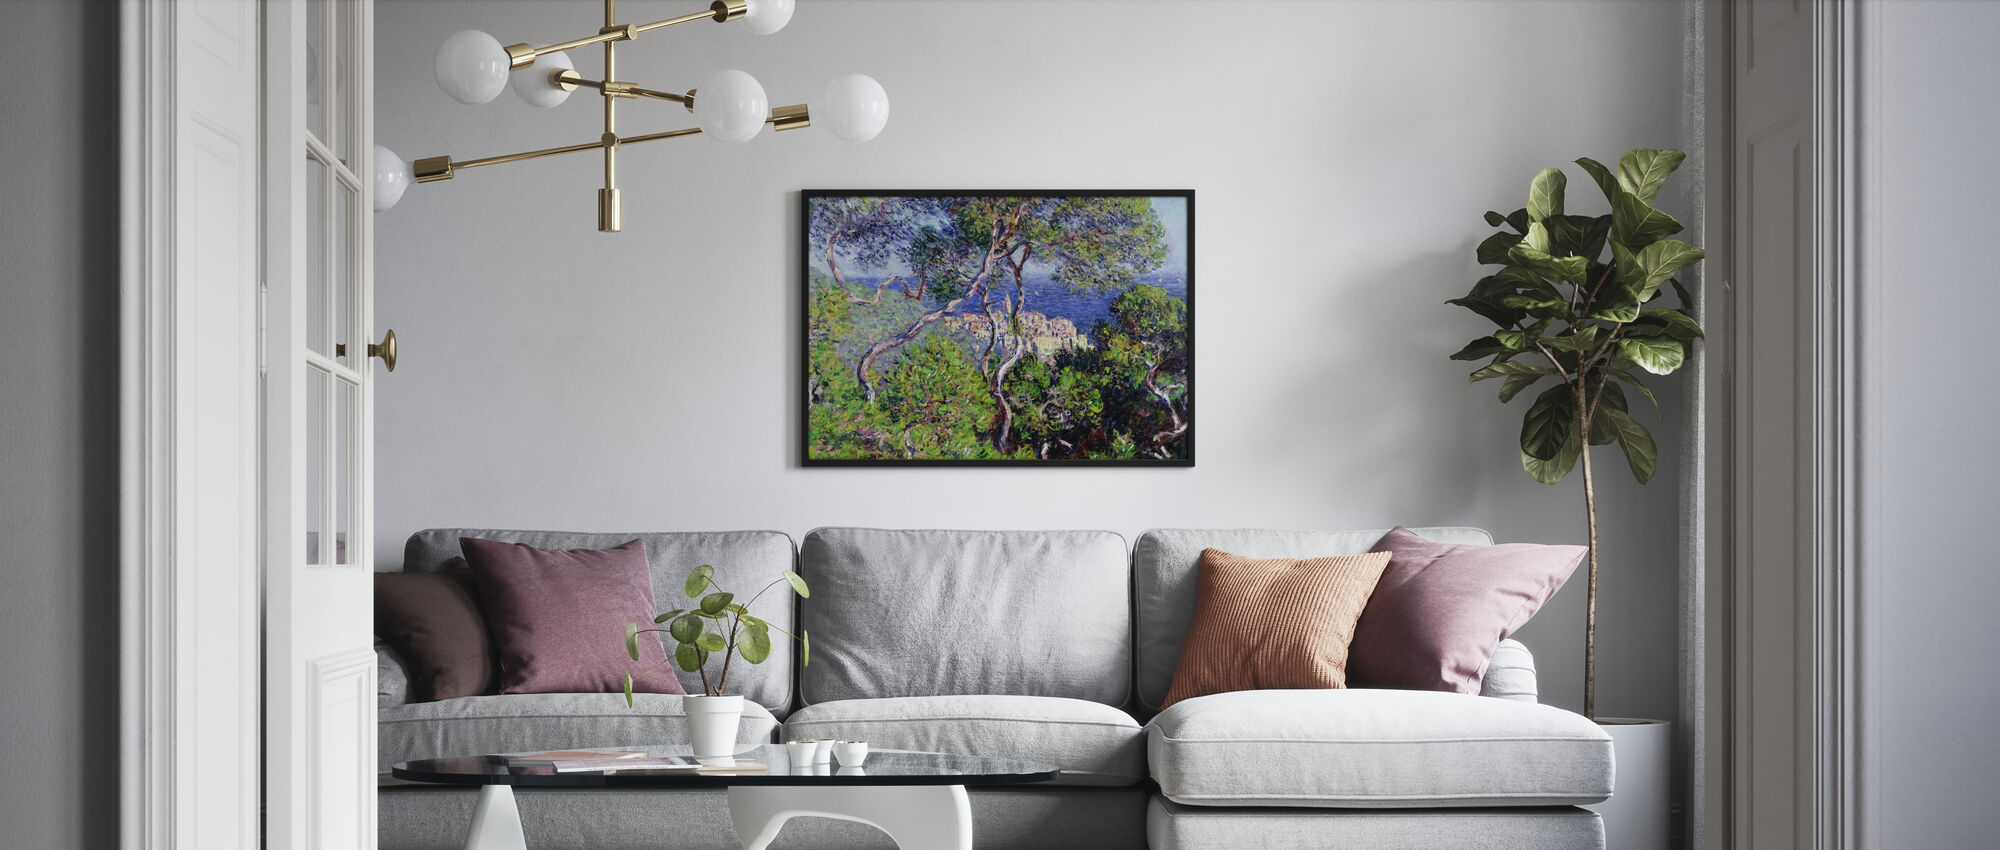 Bordighera -  Claude Monet - Affiche - Salle à manger